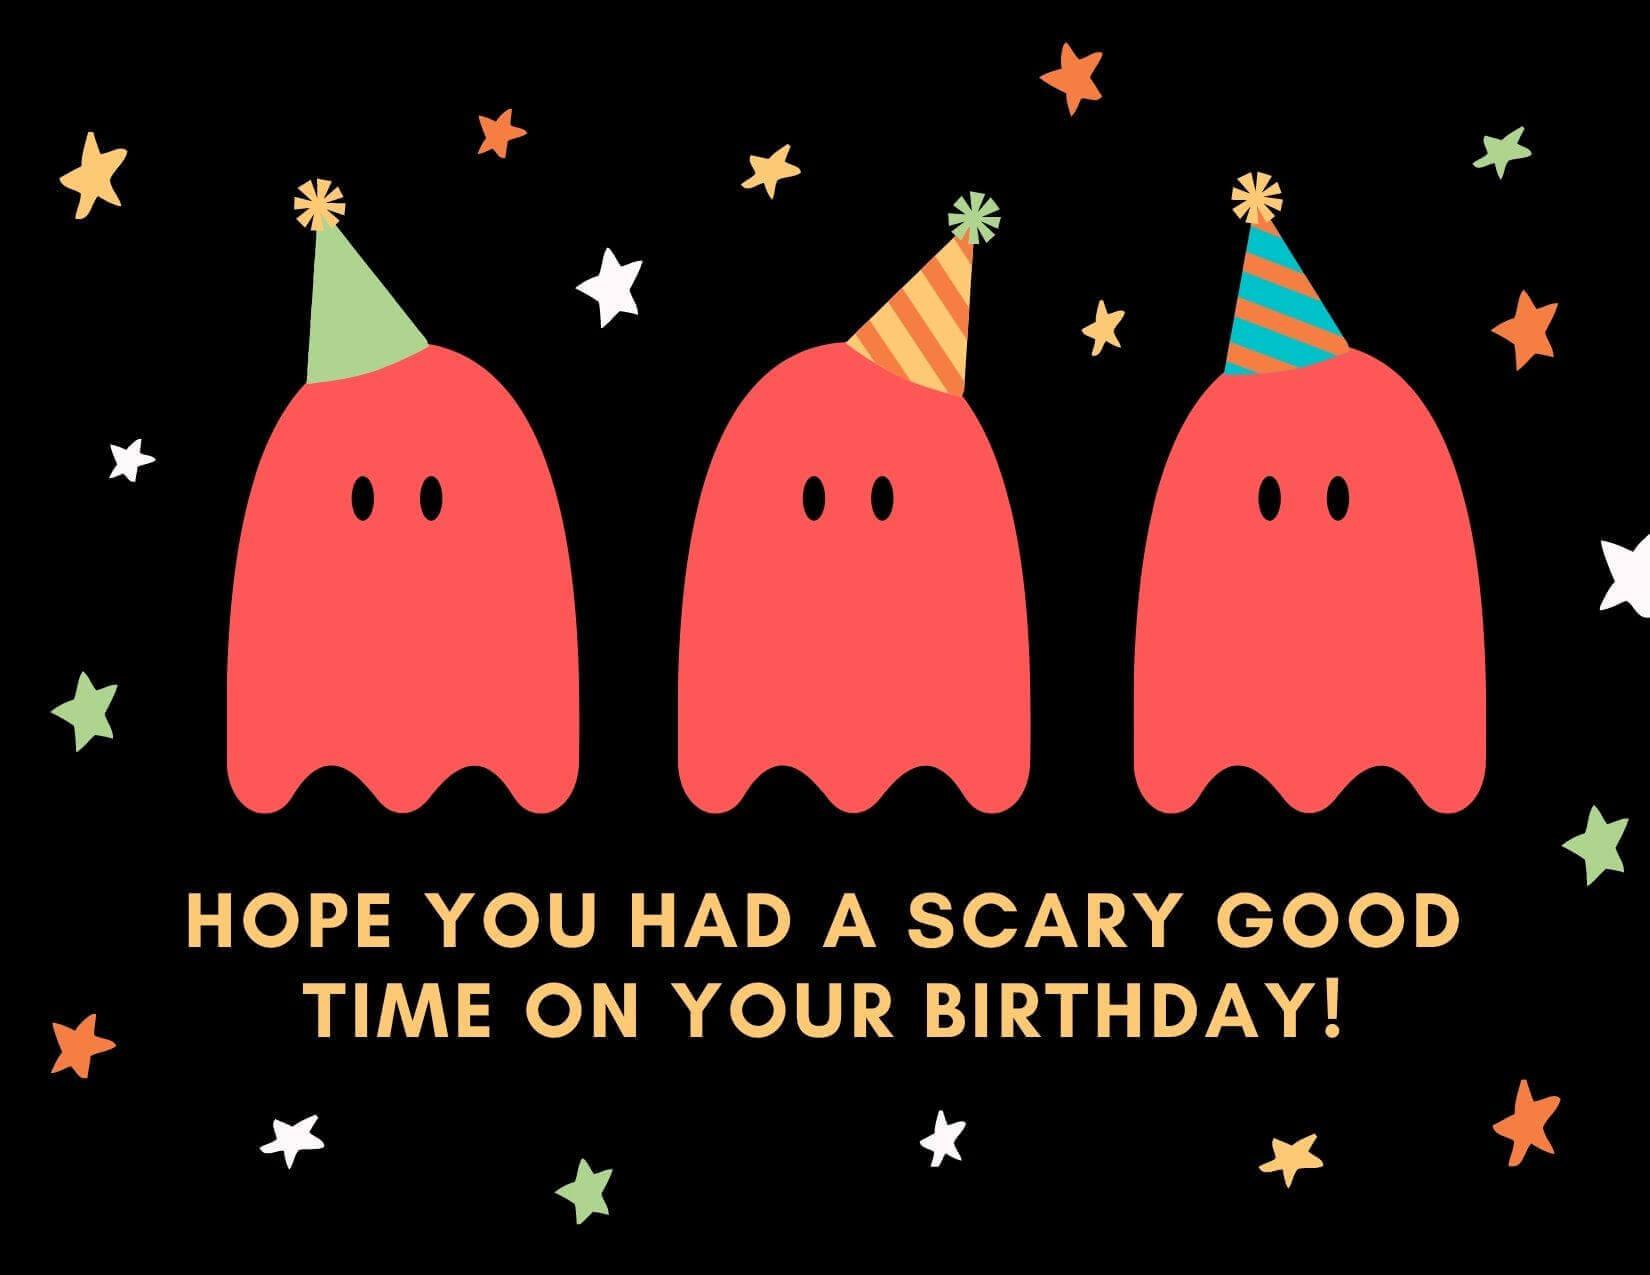 Birthday wishes for best friend girl